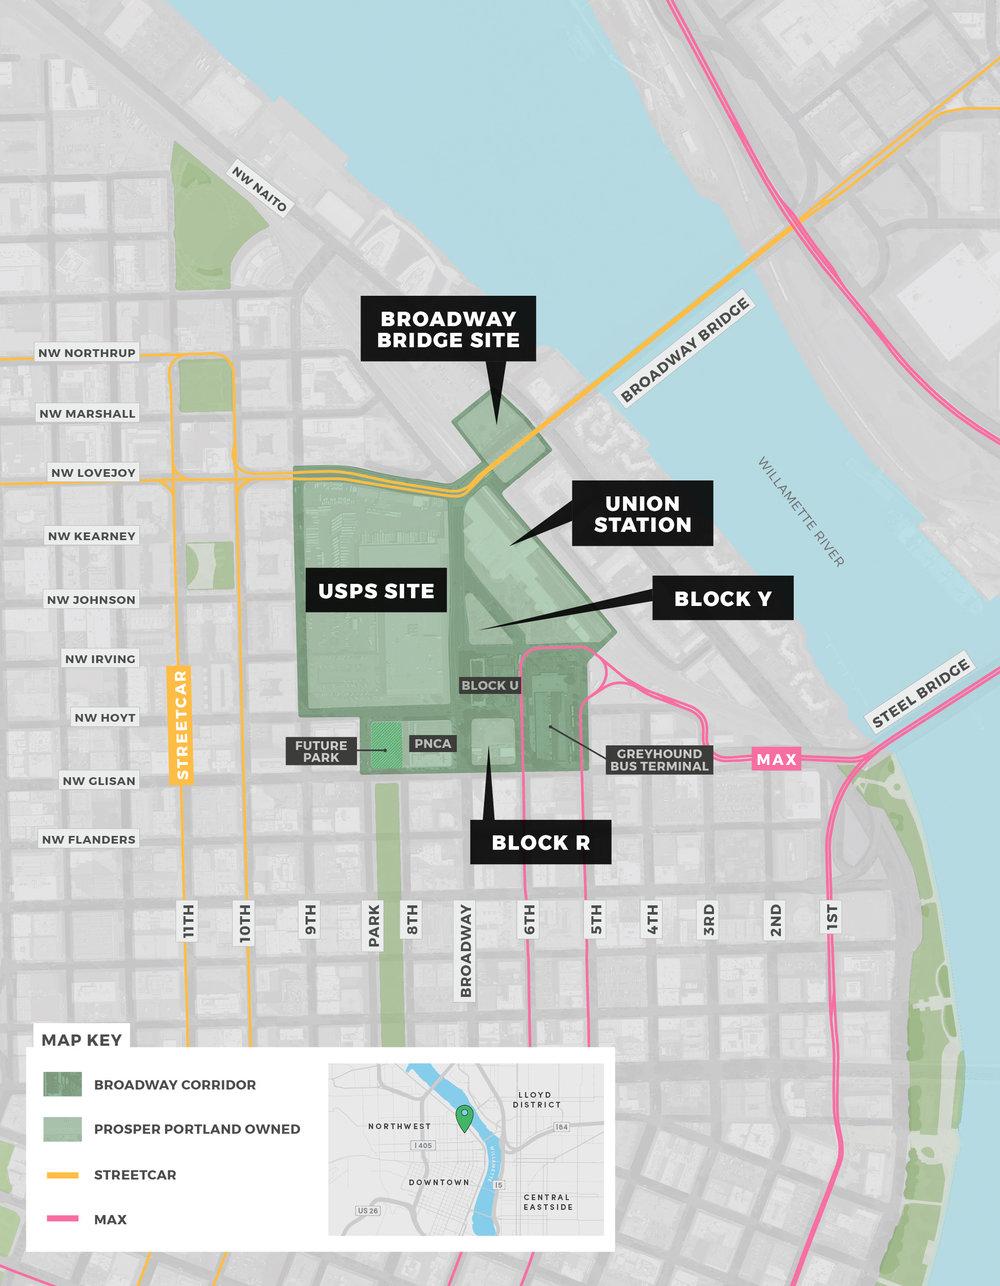 Broadway Corridor Map